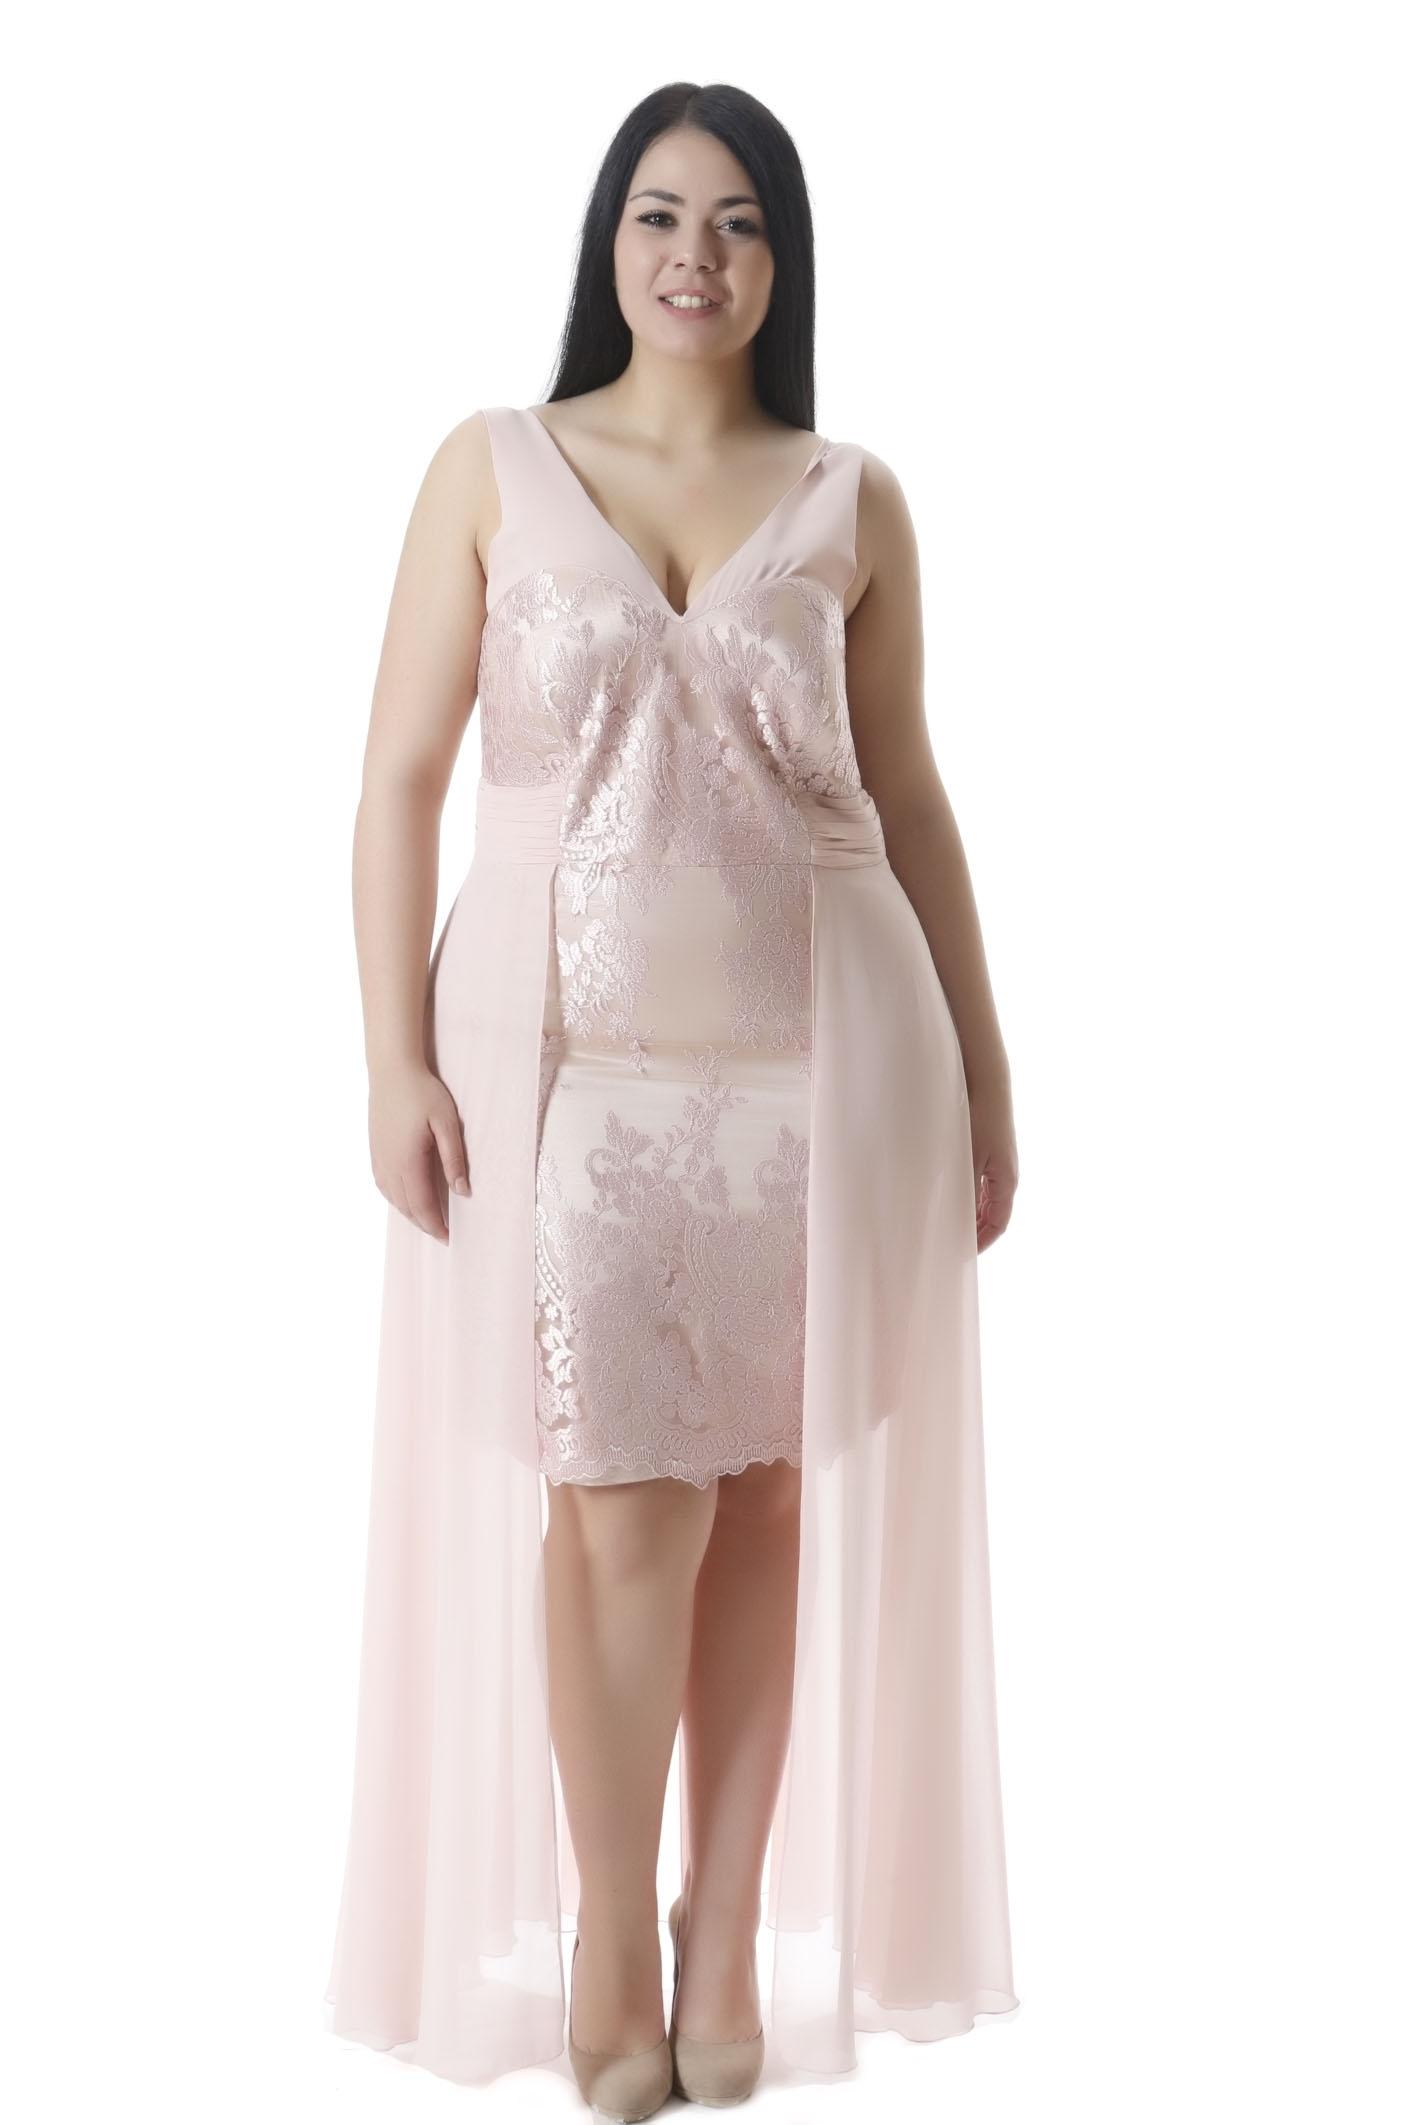 362fd2816f05 Φόρεμα mini με δαντέλα πούδρα